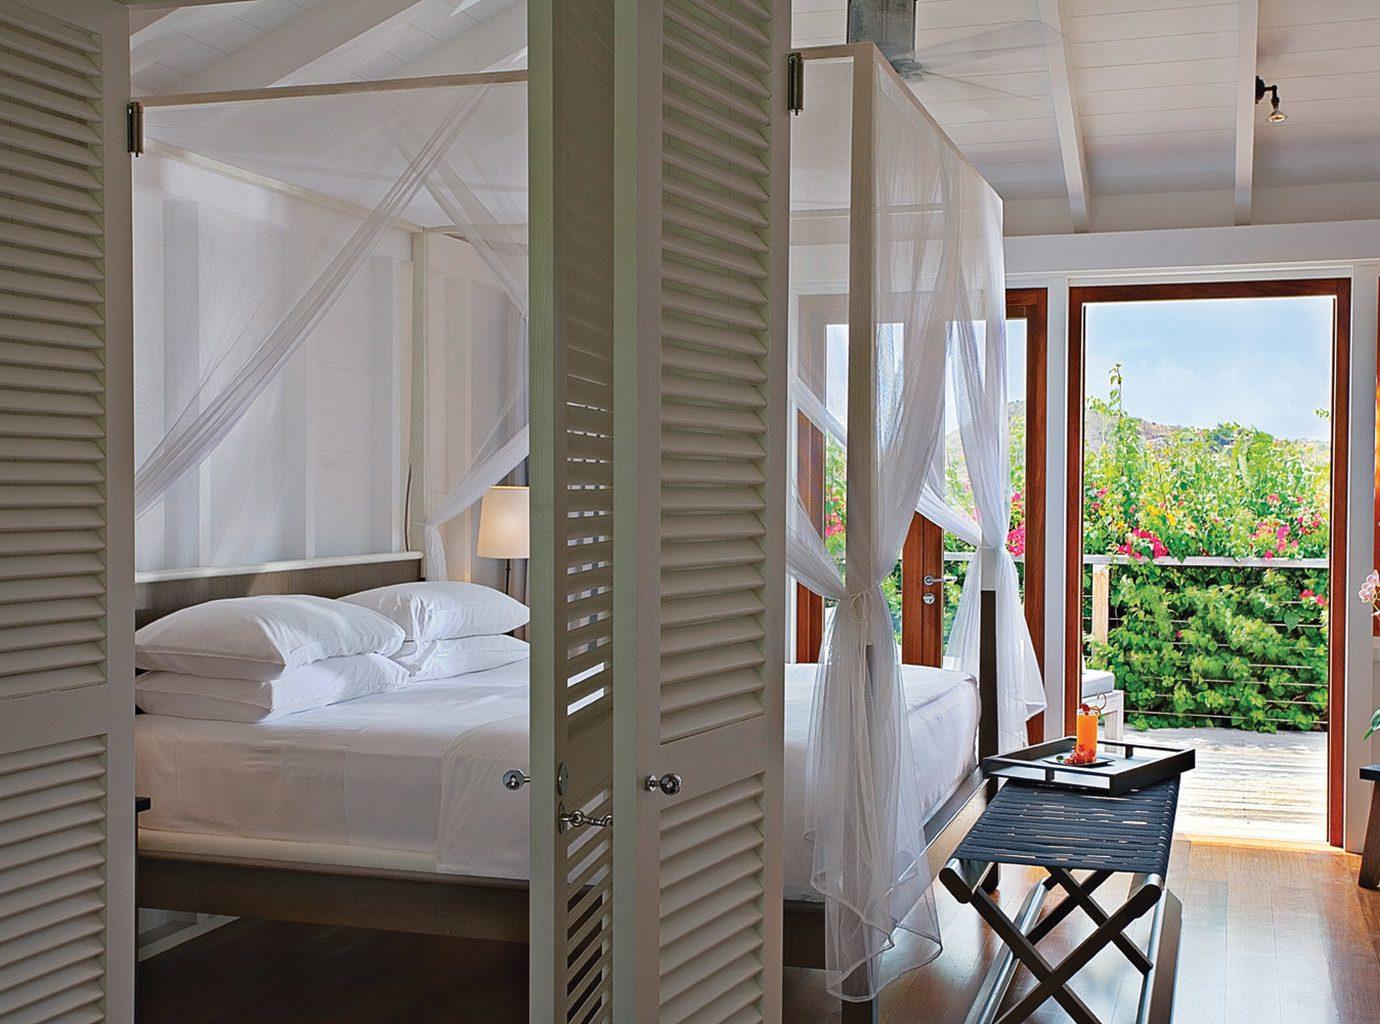 Beachfront Bedroom Honeymoon Hotels Luxury Romance Romantic Villa property cottage home porch